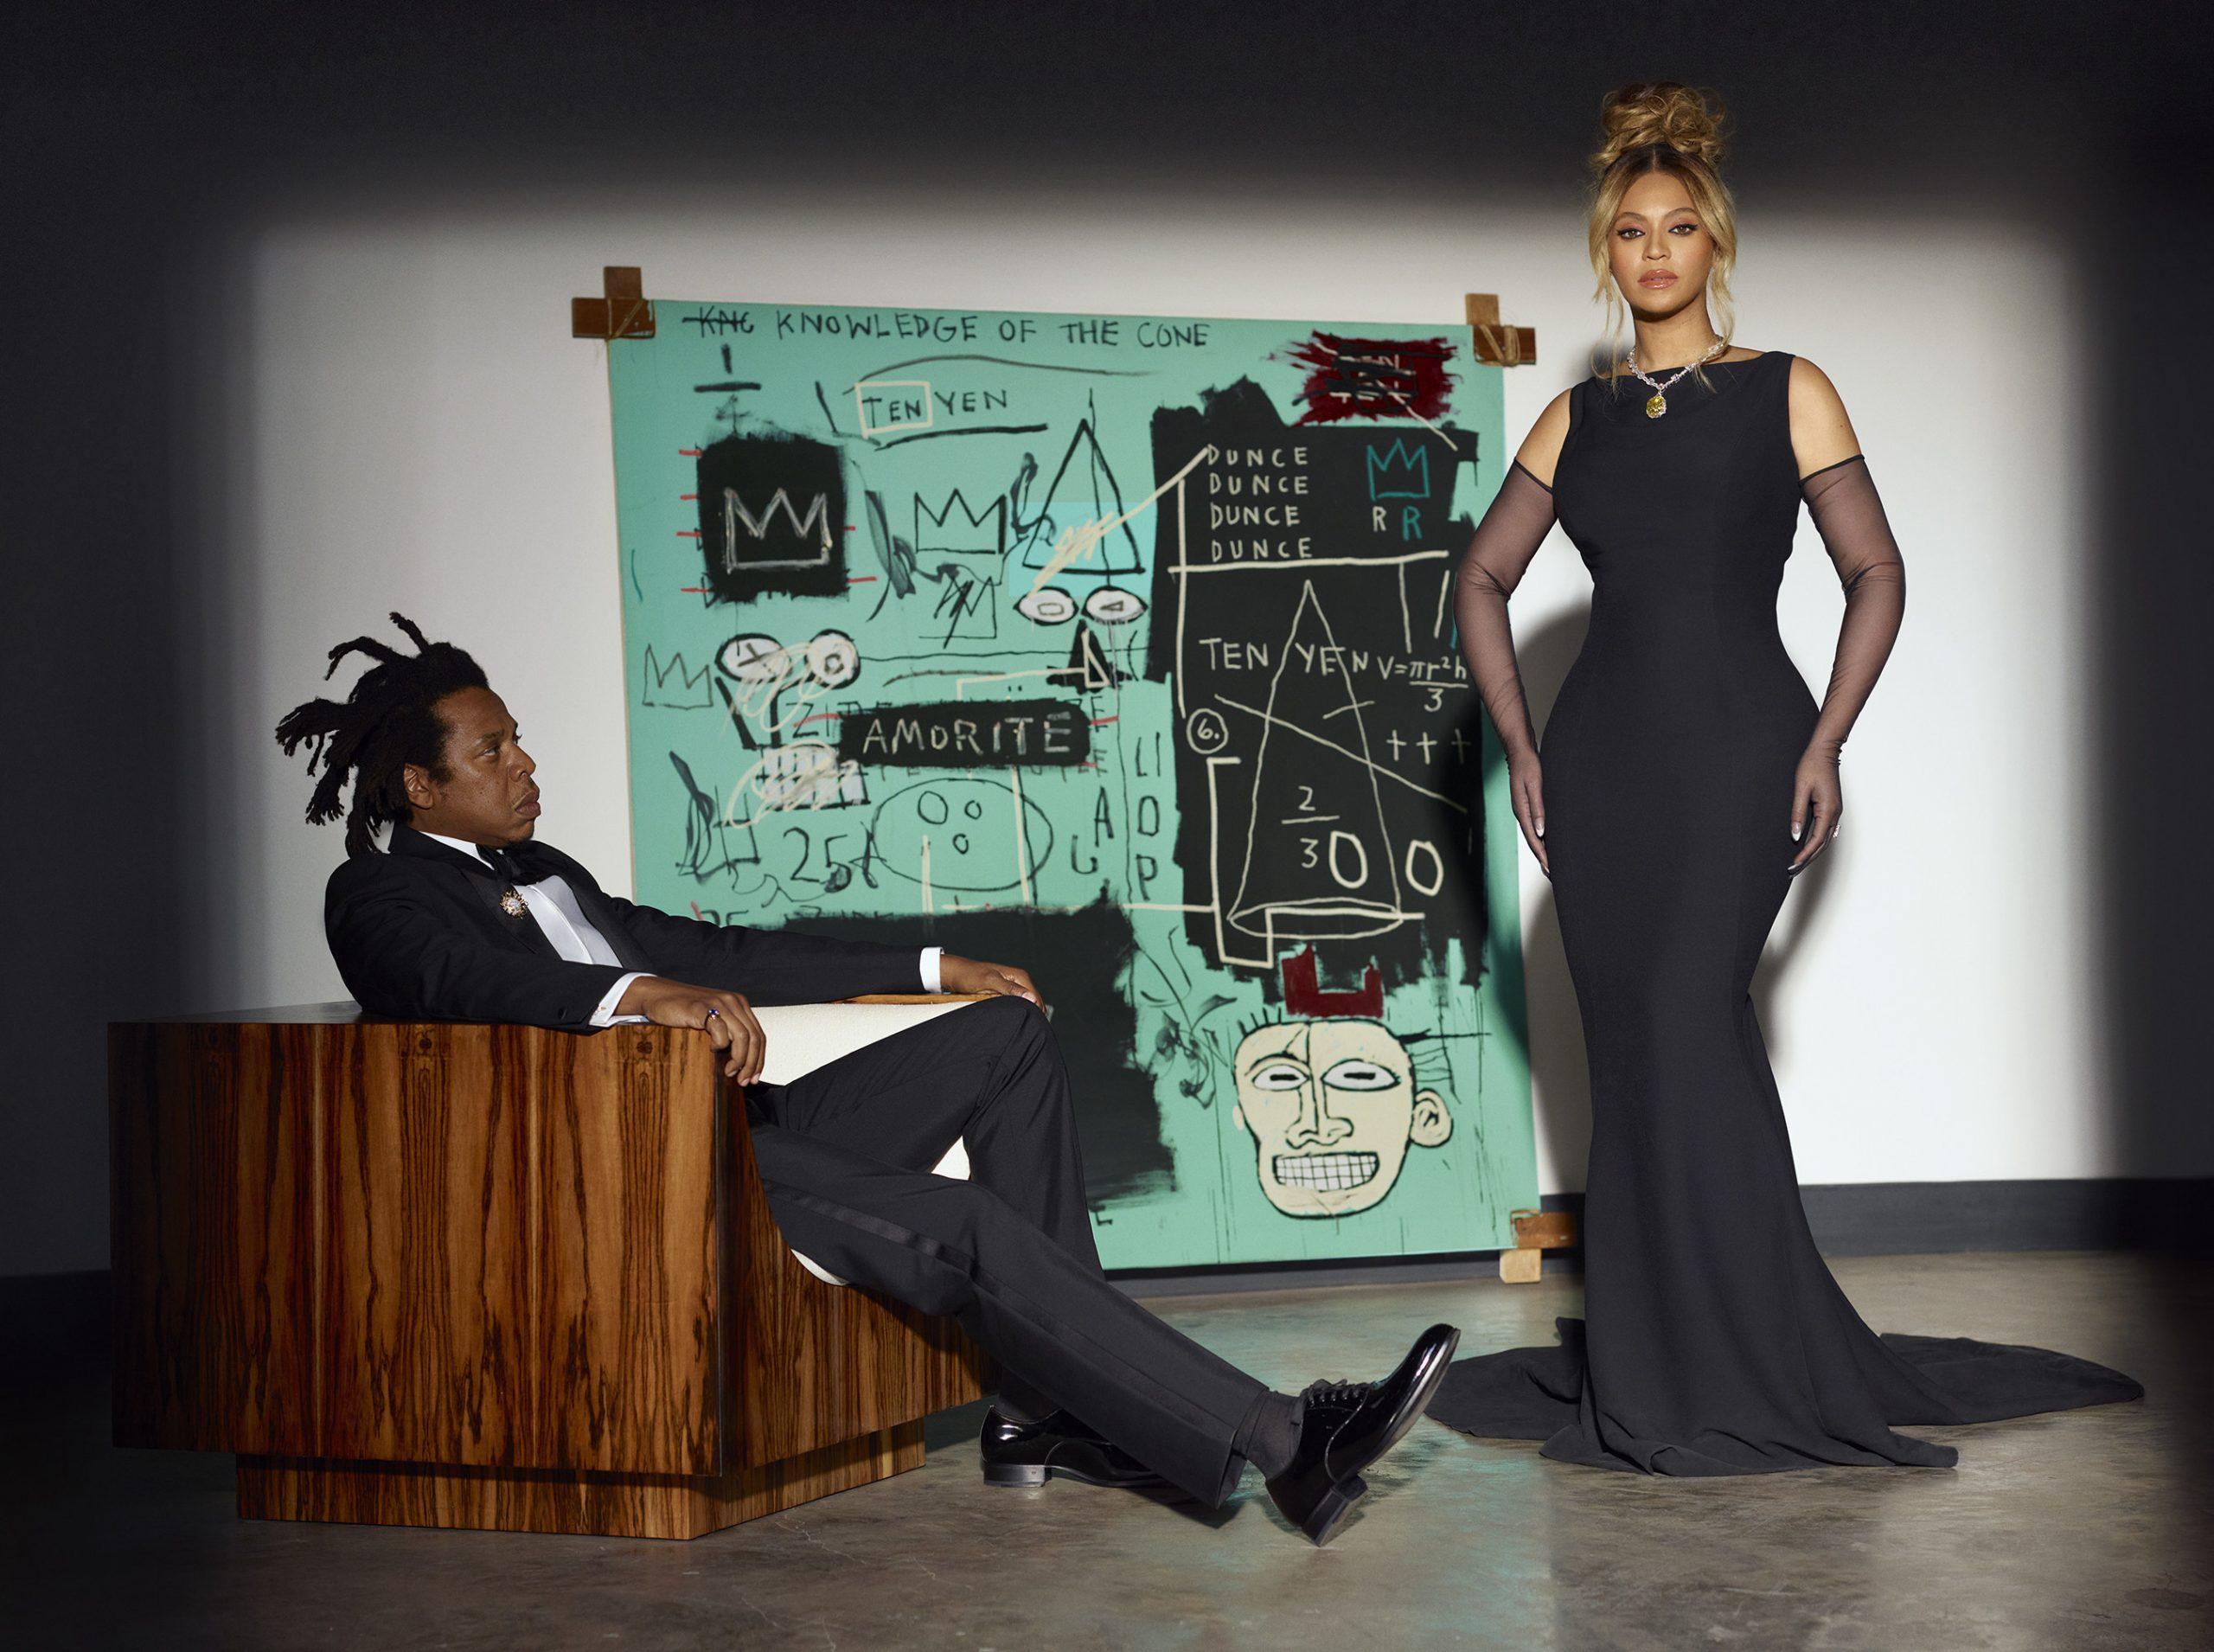 Tiffany 焕新战略新动向:将由碧昂斯和Jay-Z夫妇共同演绎广告大片,传奇大黄钻首次出镜